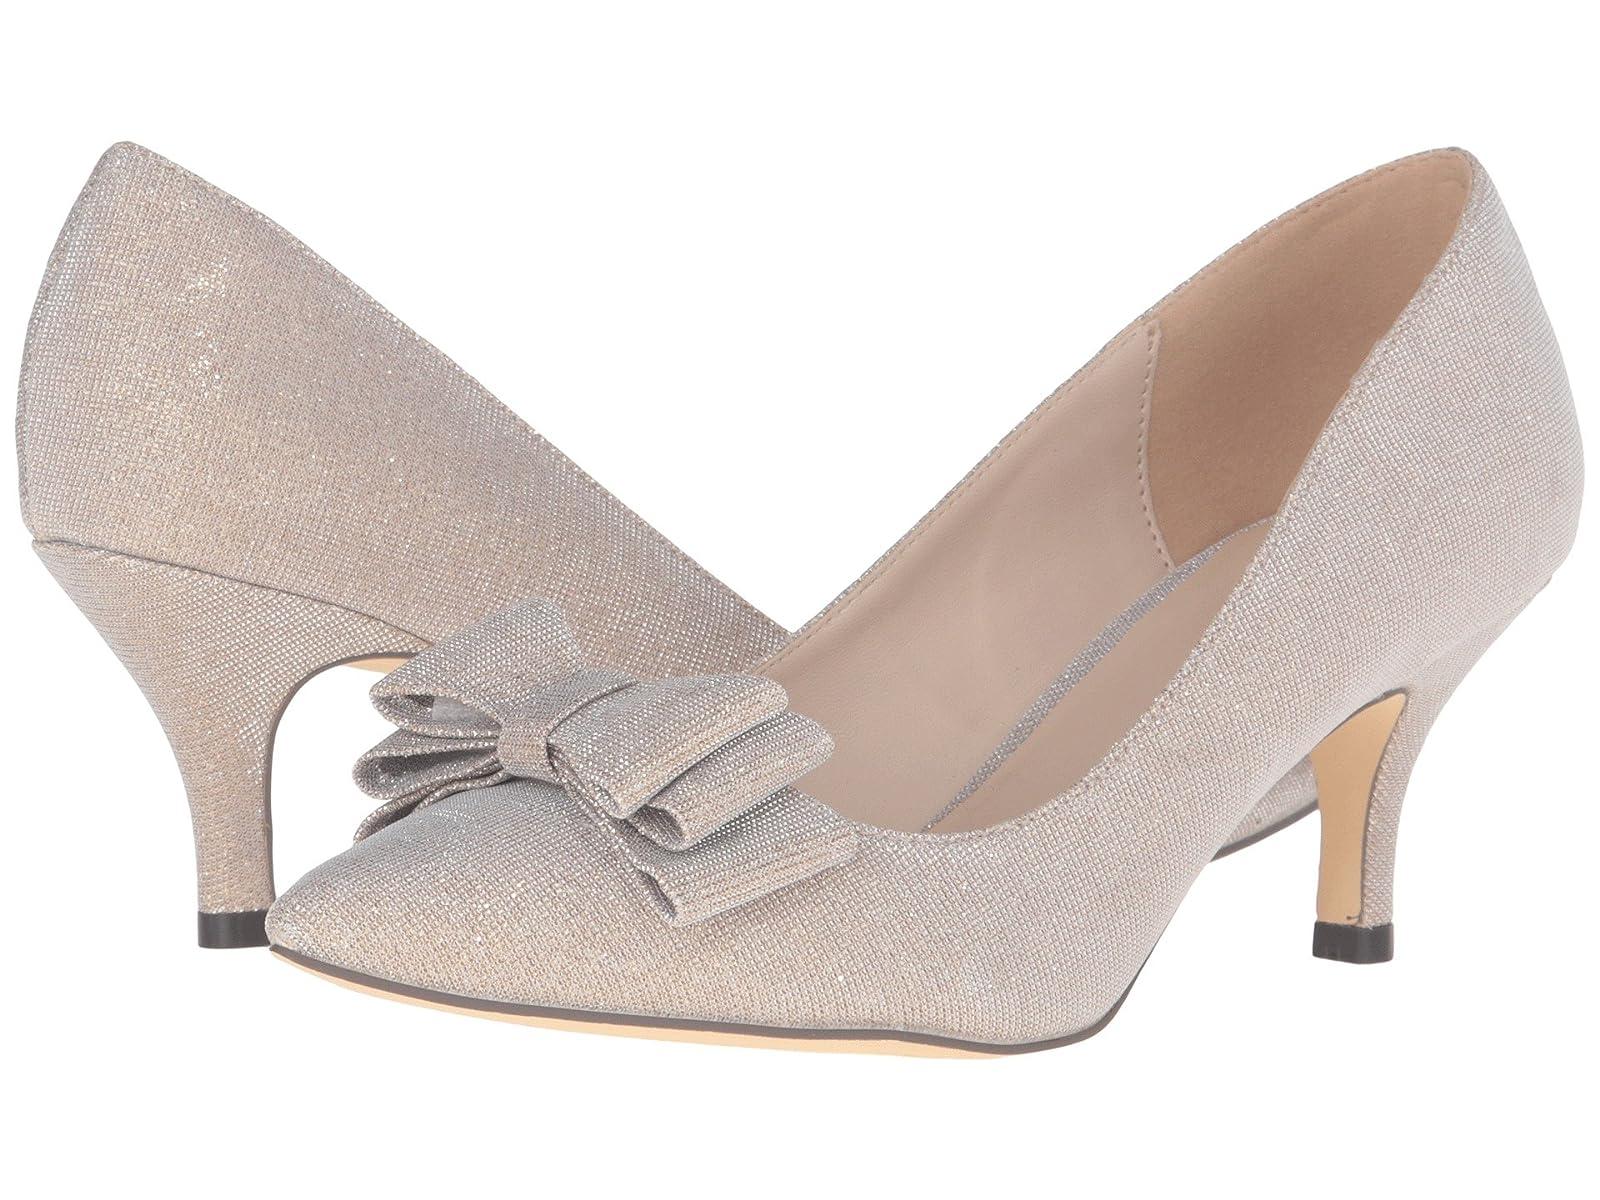 Menbur SilCheap and distinctive eye-catching shoes